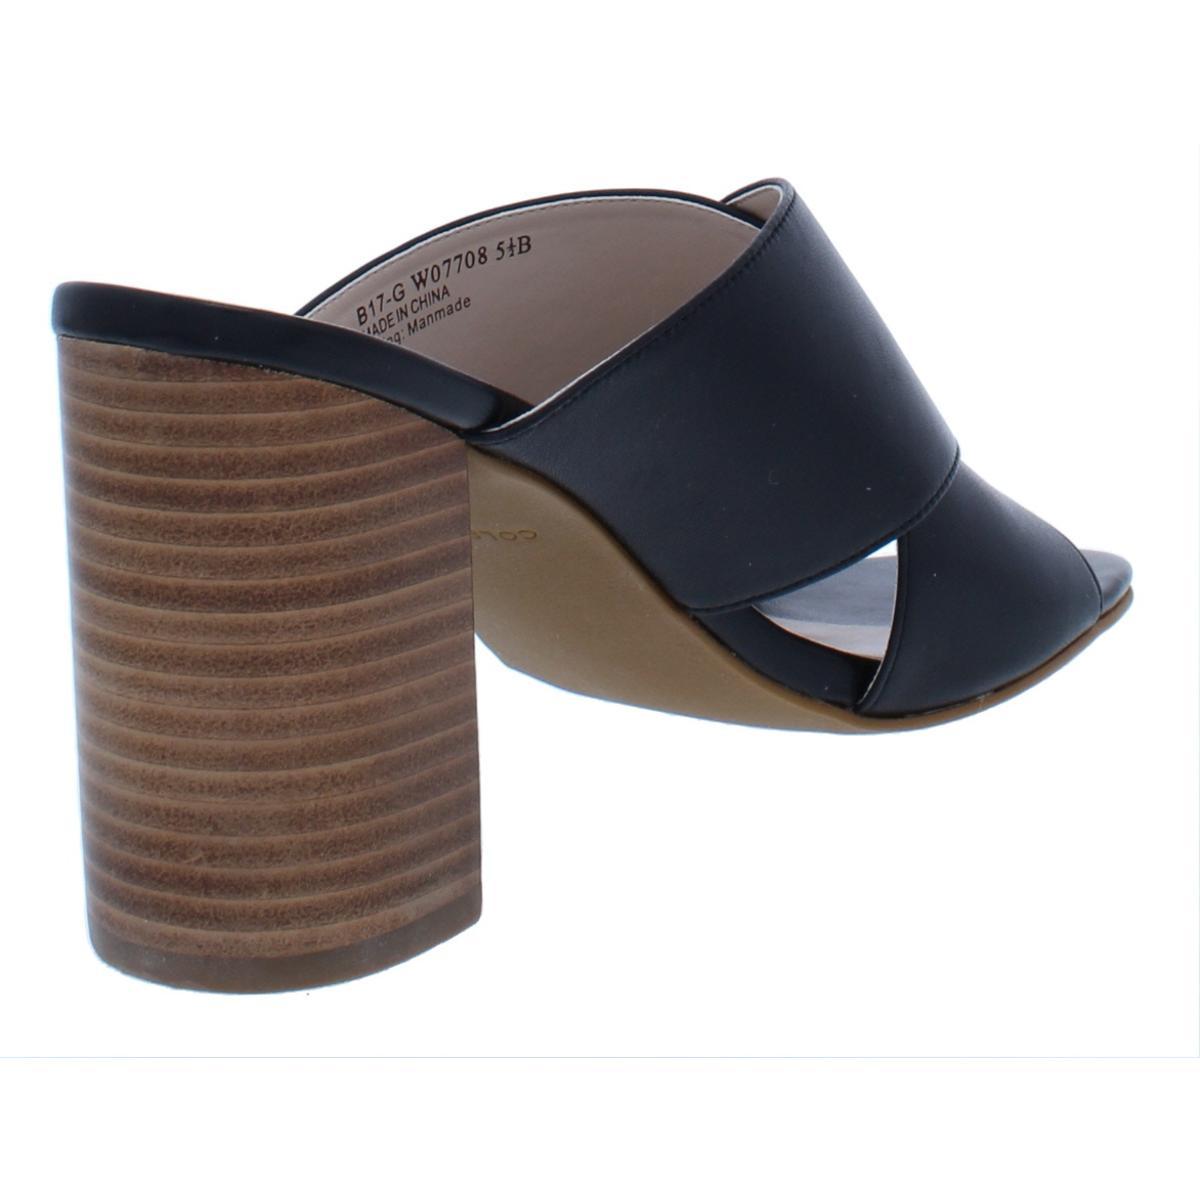 783ee466e0b Details about Cole Haan Womens Gabby Leather Criss-Cross Open Toe Heels  Sandals BHFO 9565